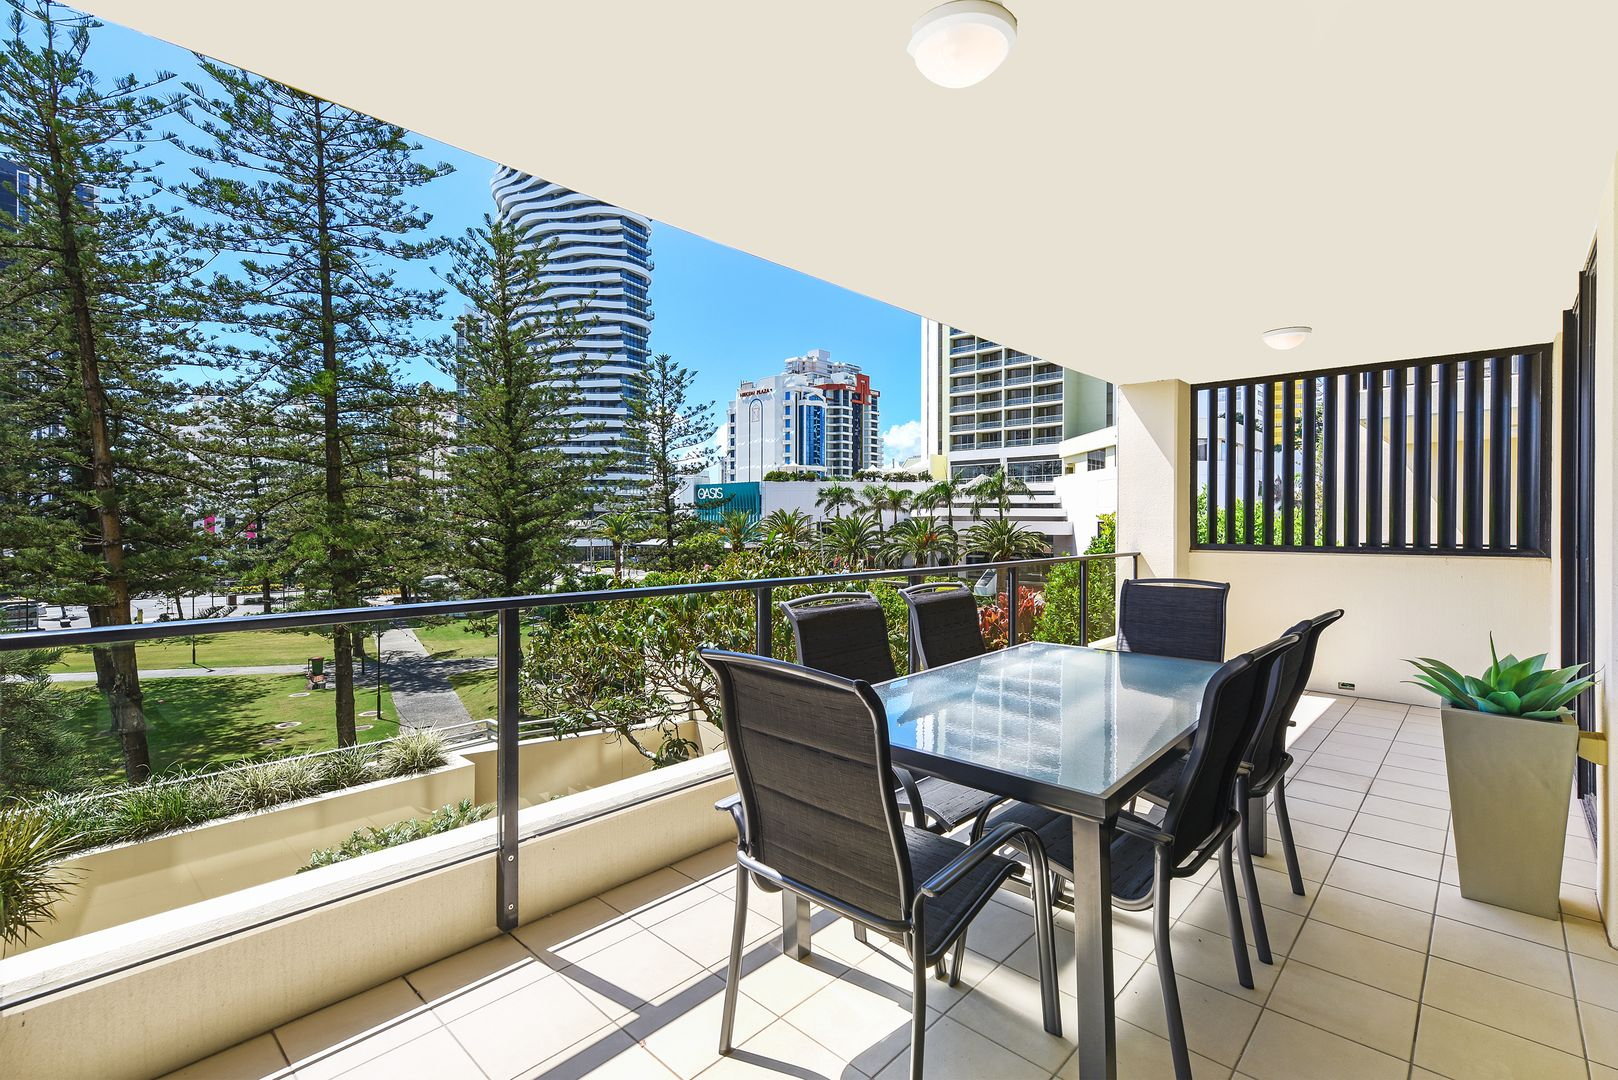 203 2685-2689 Gold Coast Highway, Broadbeach QLD 4218, Image 0